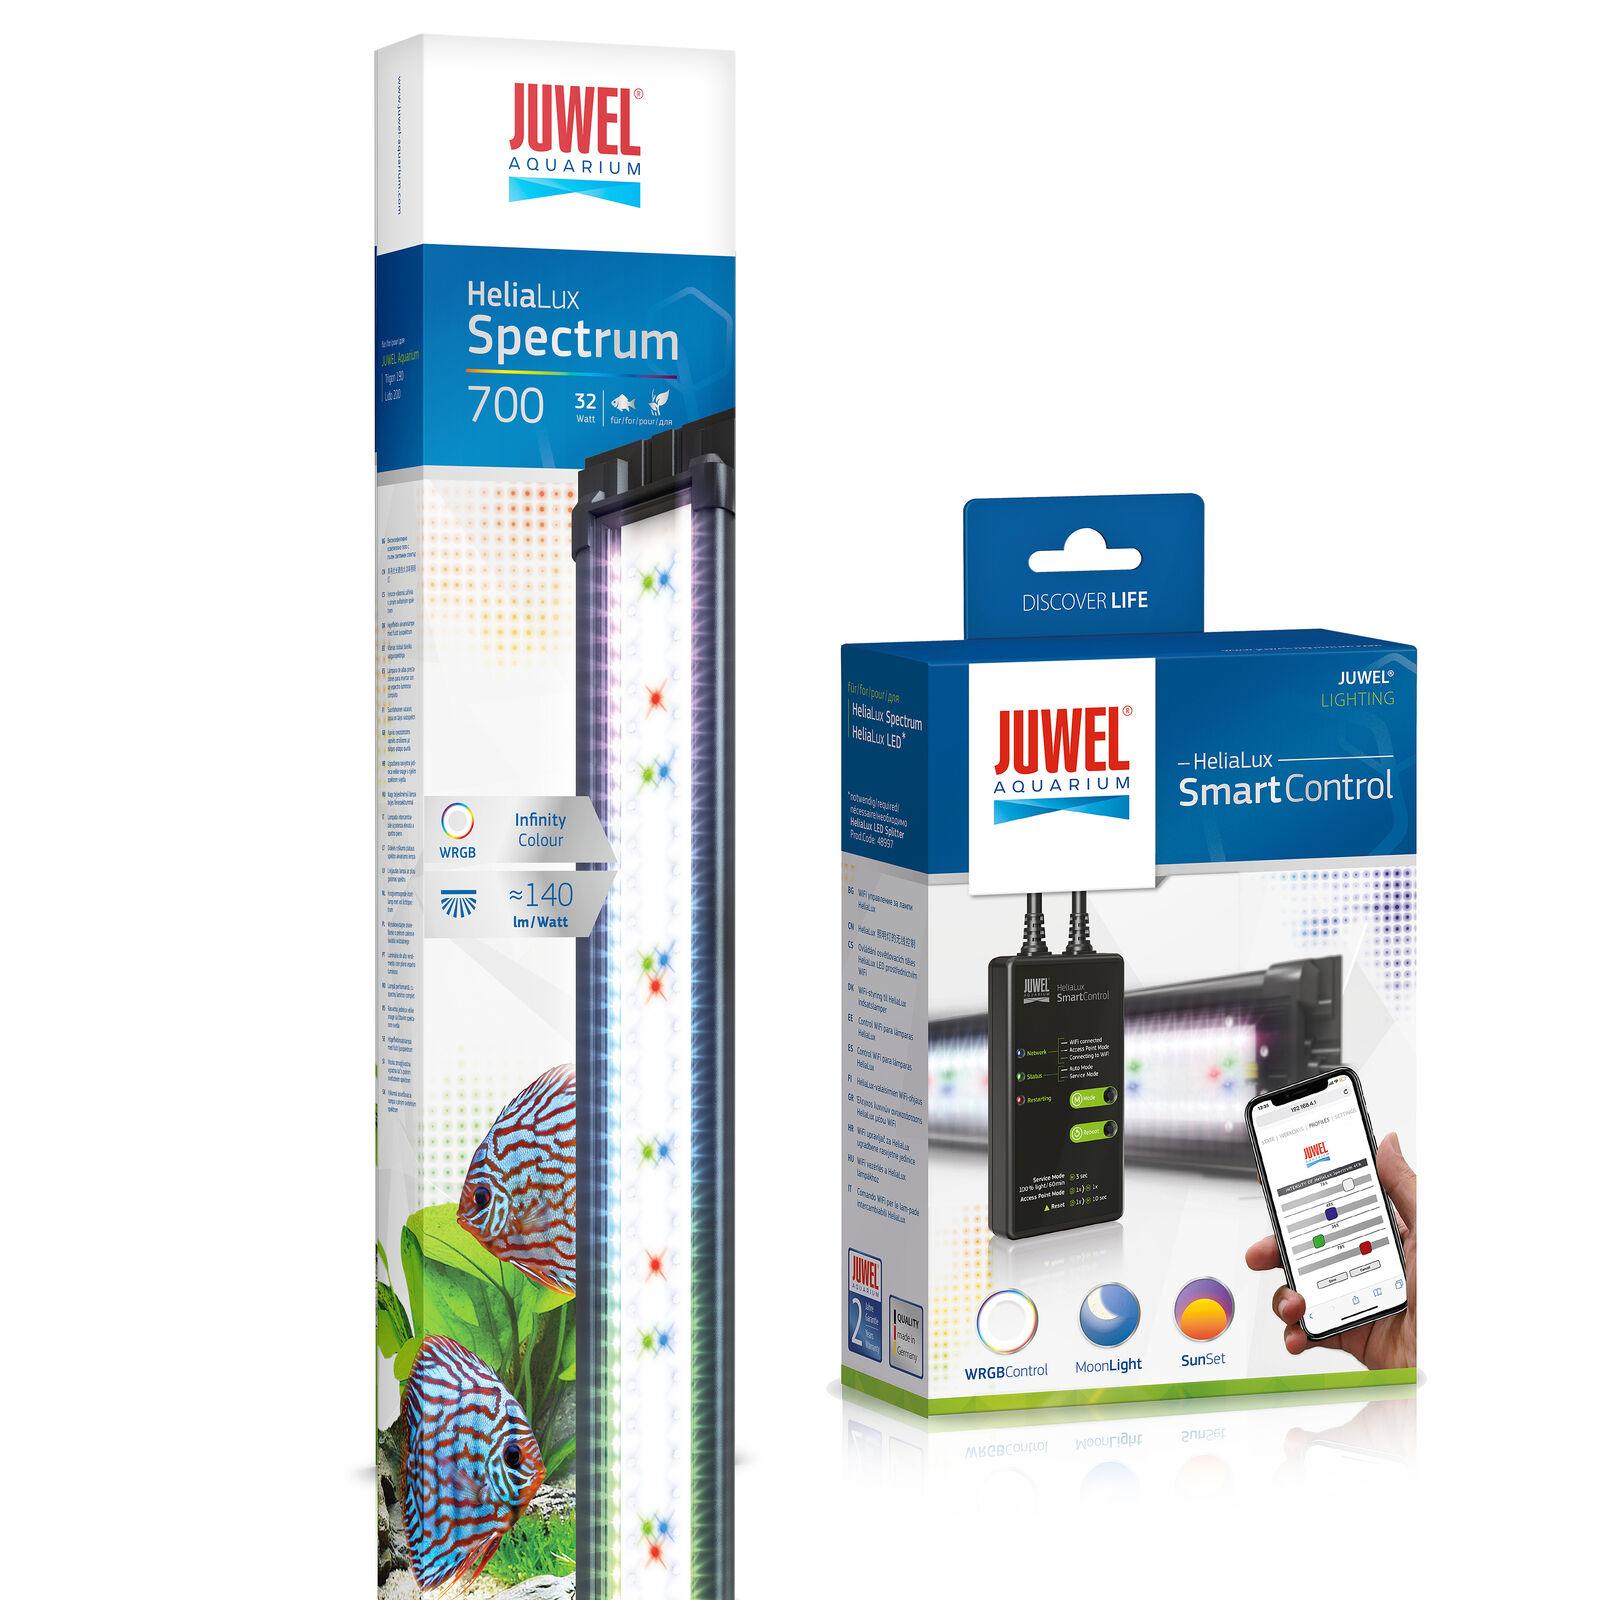 Juwel HeliaLux LED LED Einsatzleuchte